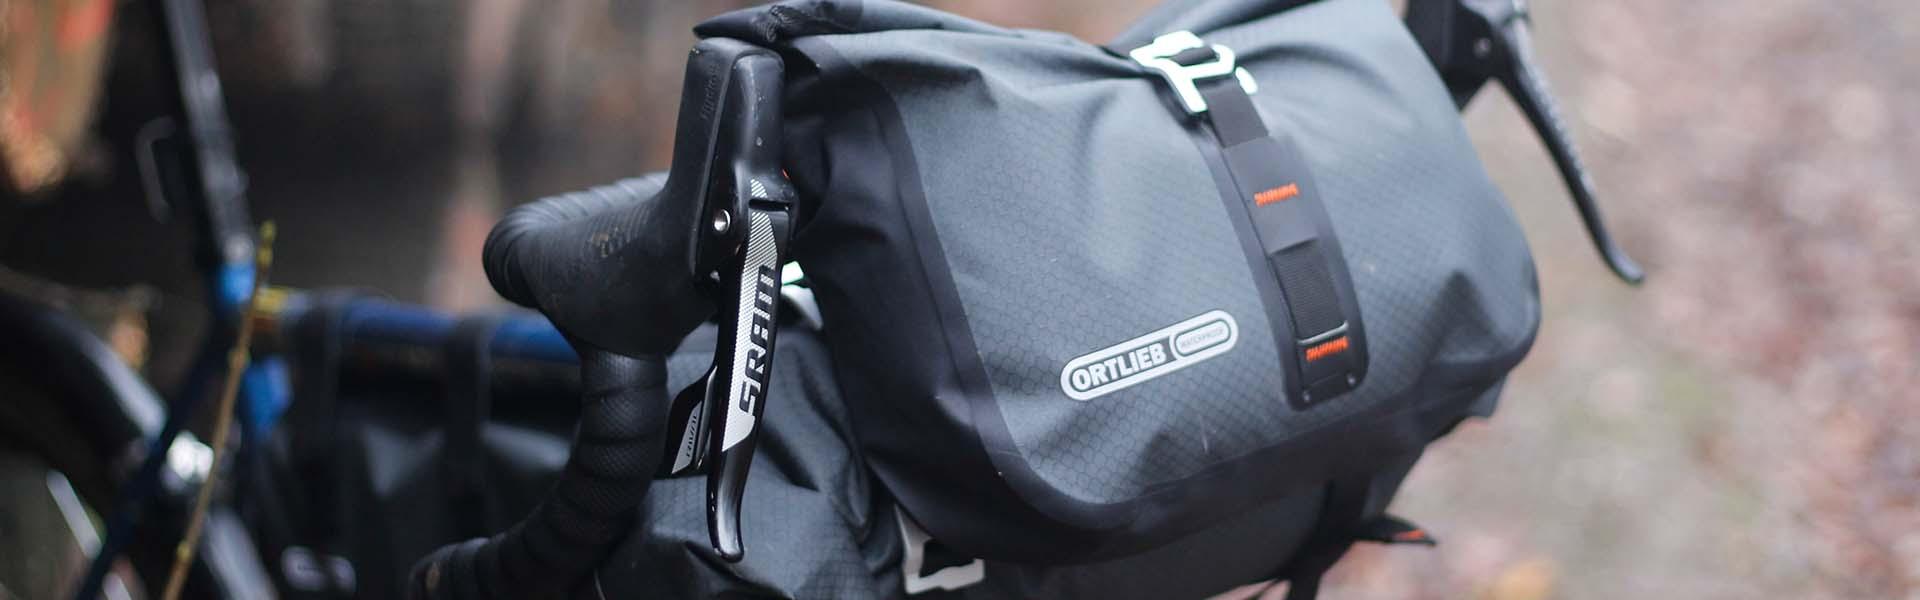 A Bikepacking mozgalom - Ortlieb váztáska bemutató - Interjú Gangel Marcellel